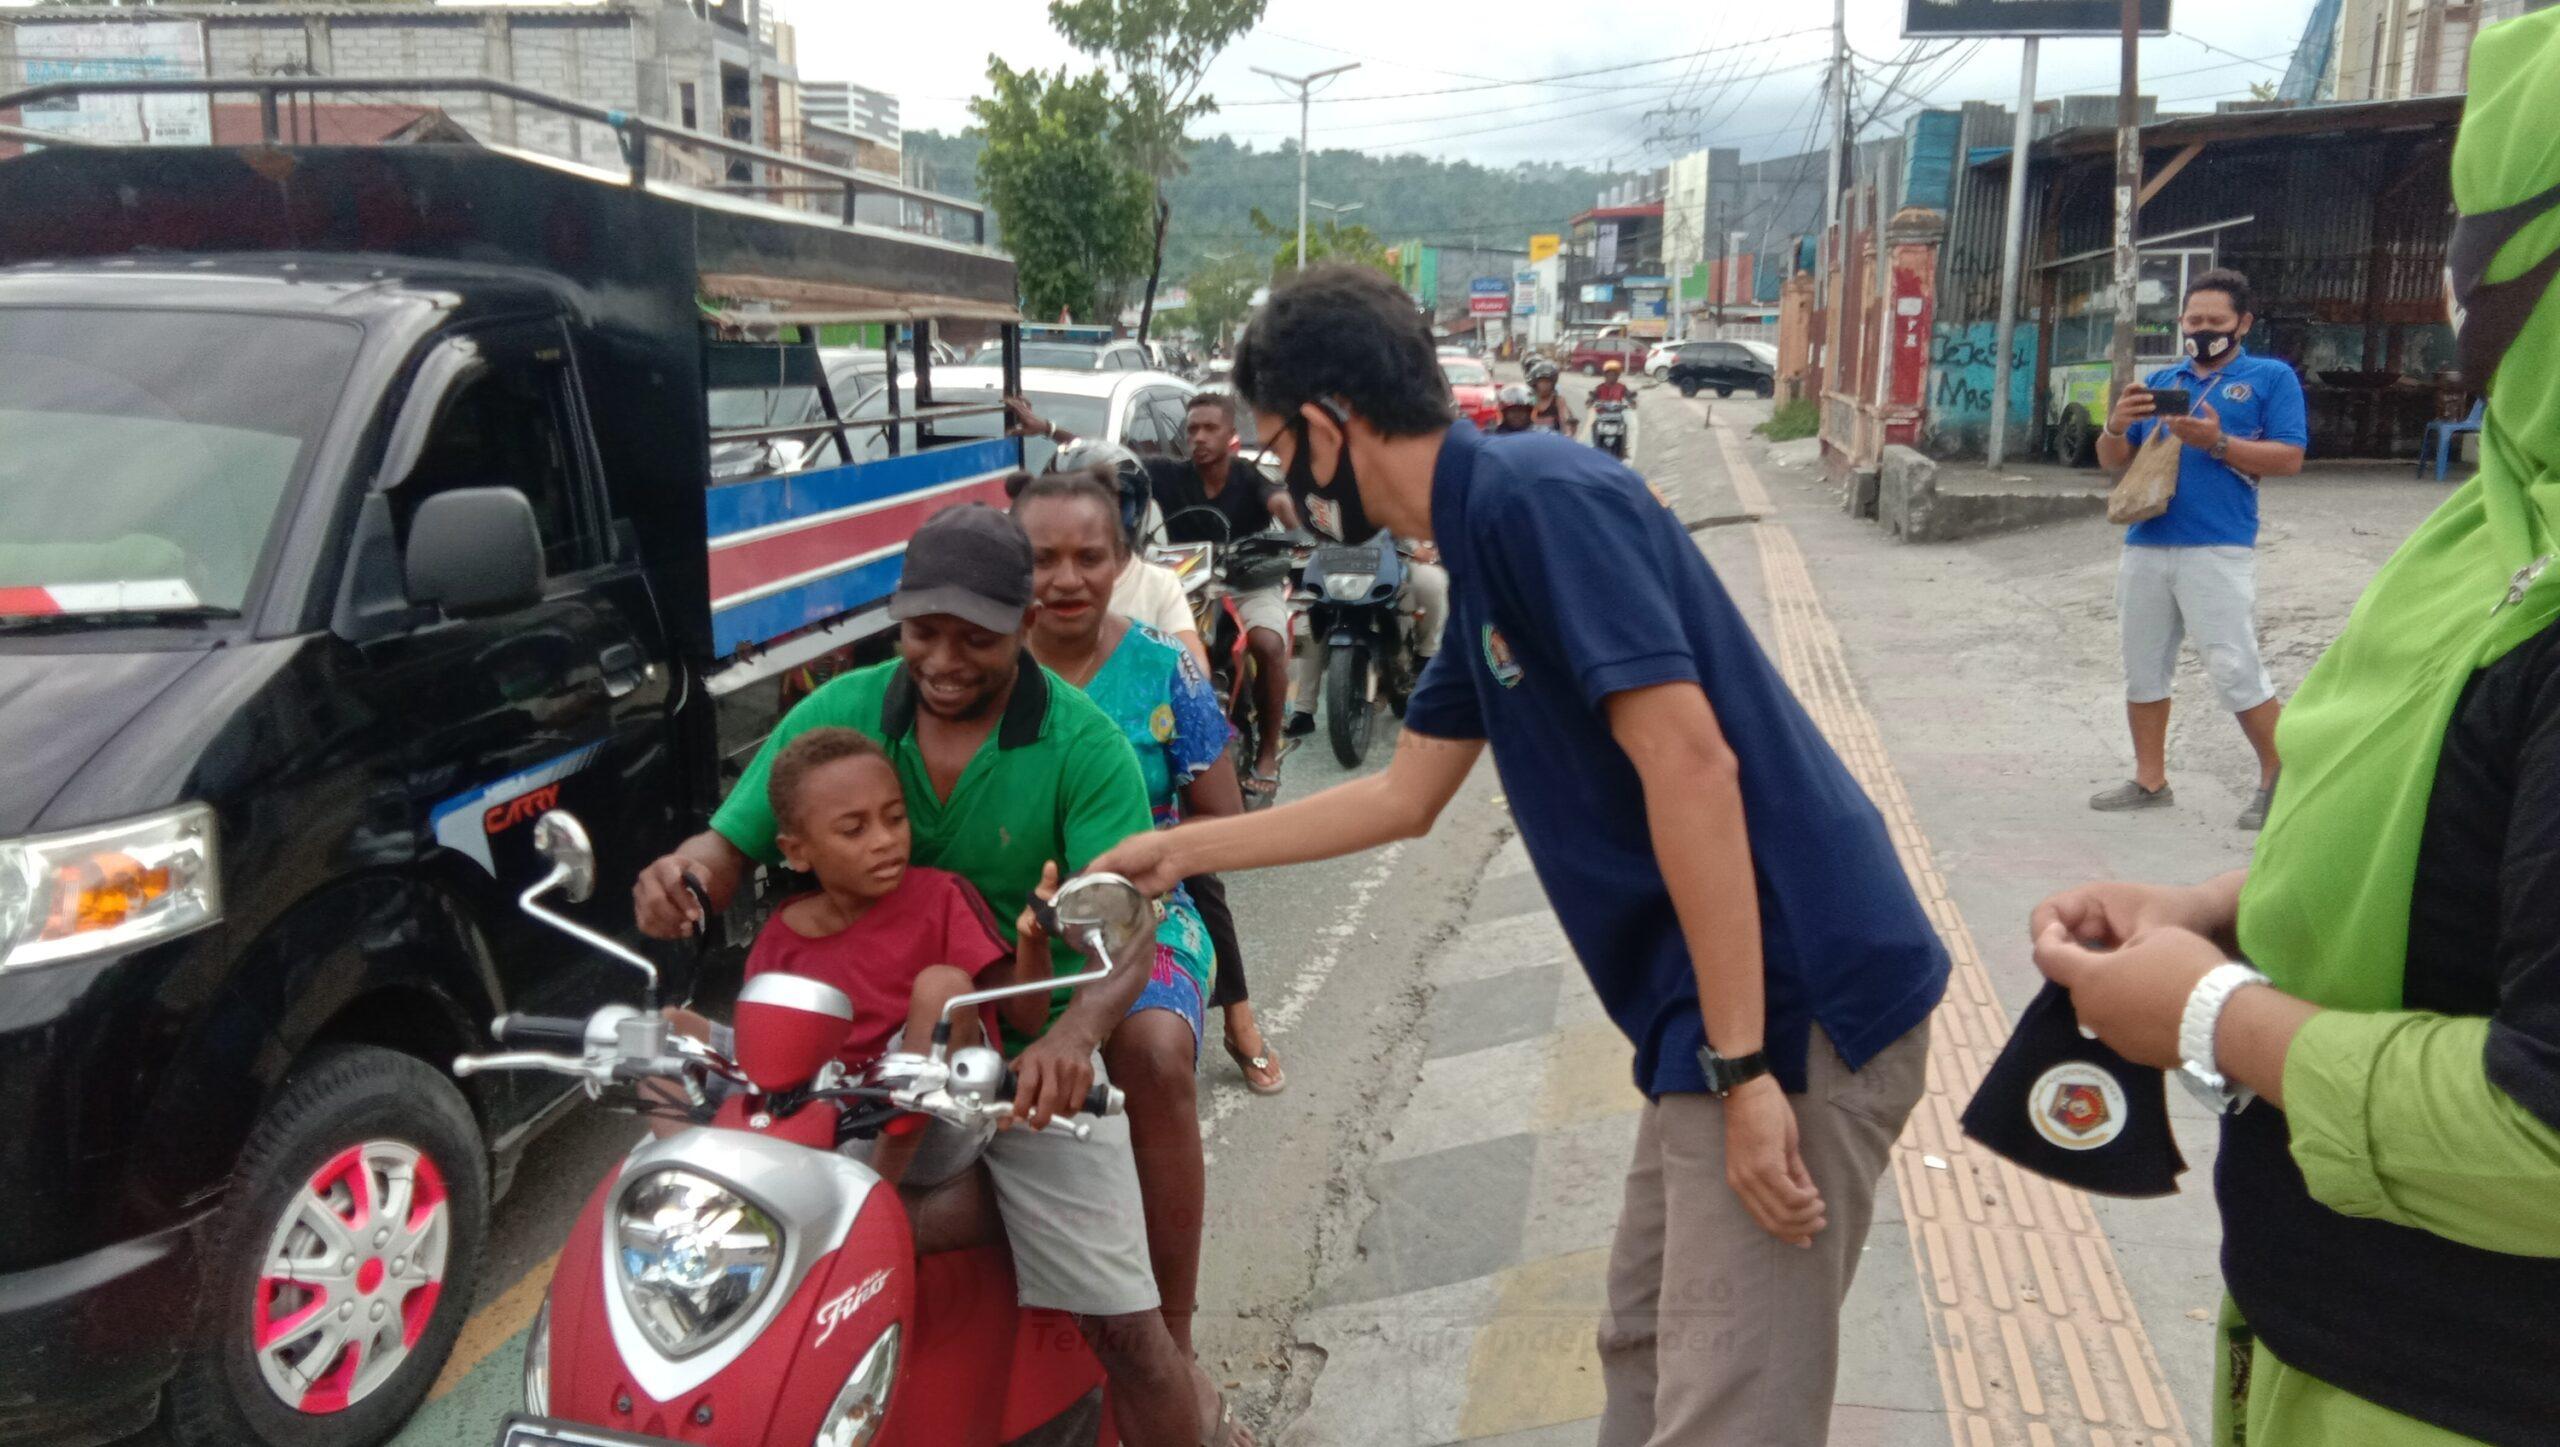 PWI Papua Barat Bagi 1000 Masker di Manokwari 11 IMG 20210207 WA0108 1 scaled